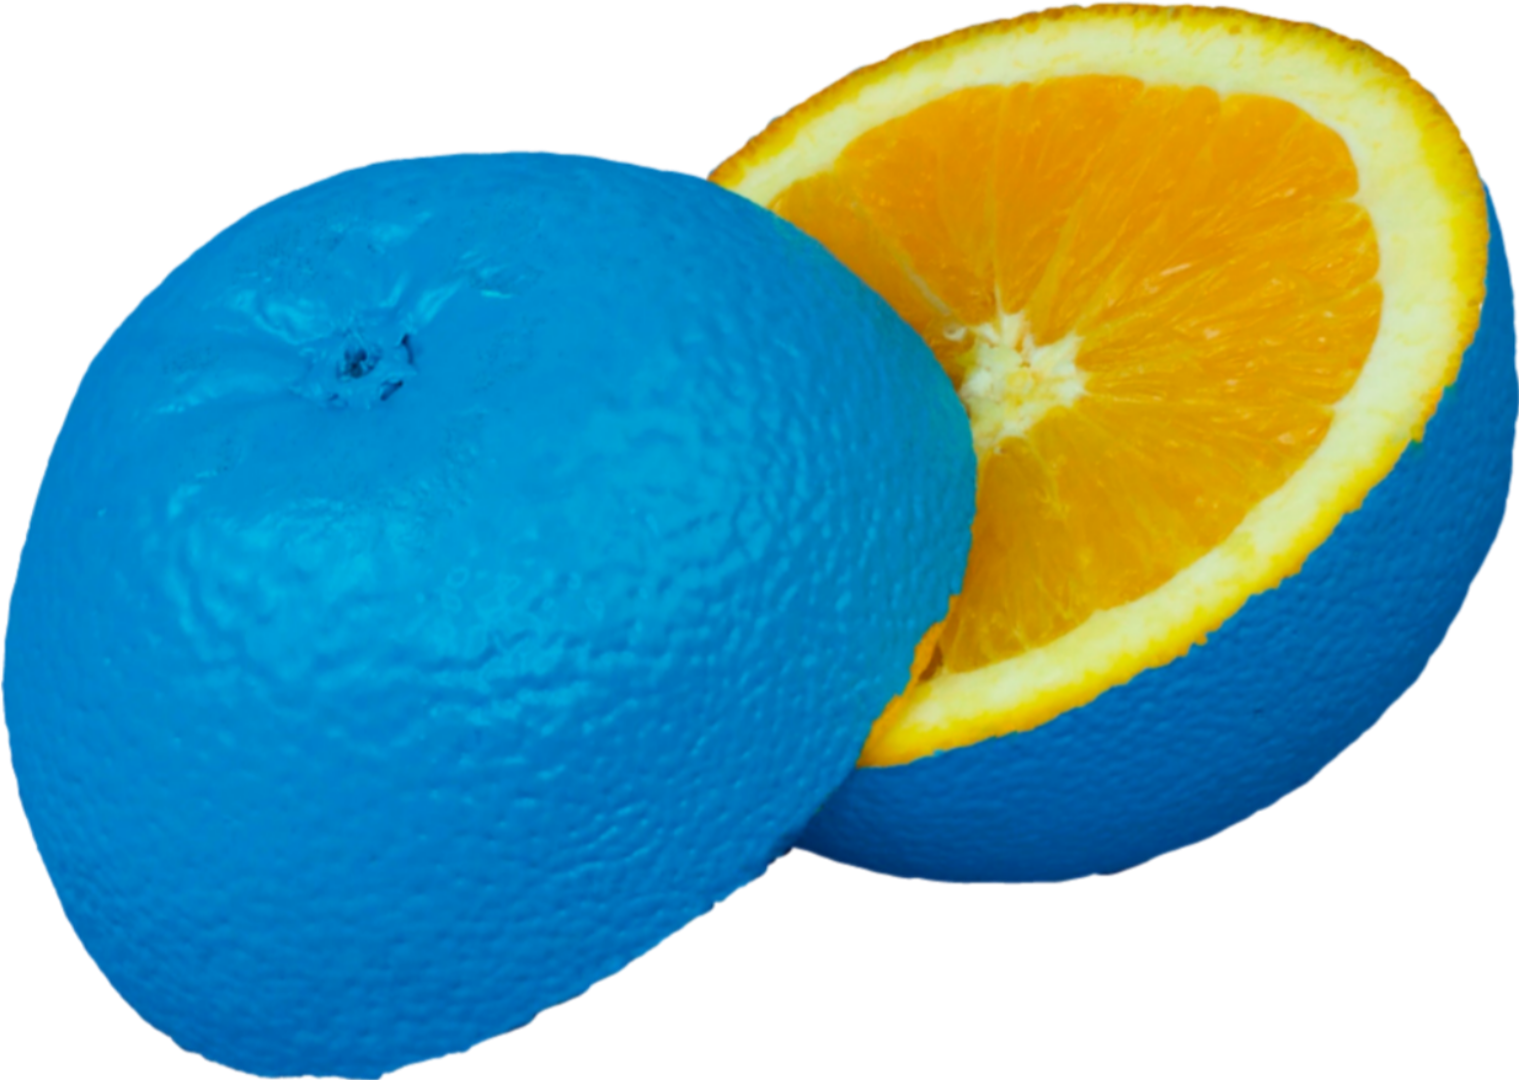 blue orange paint fruit contemporaryart blueorange...